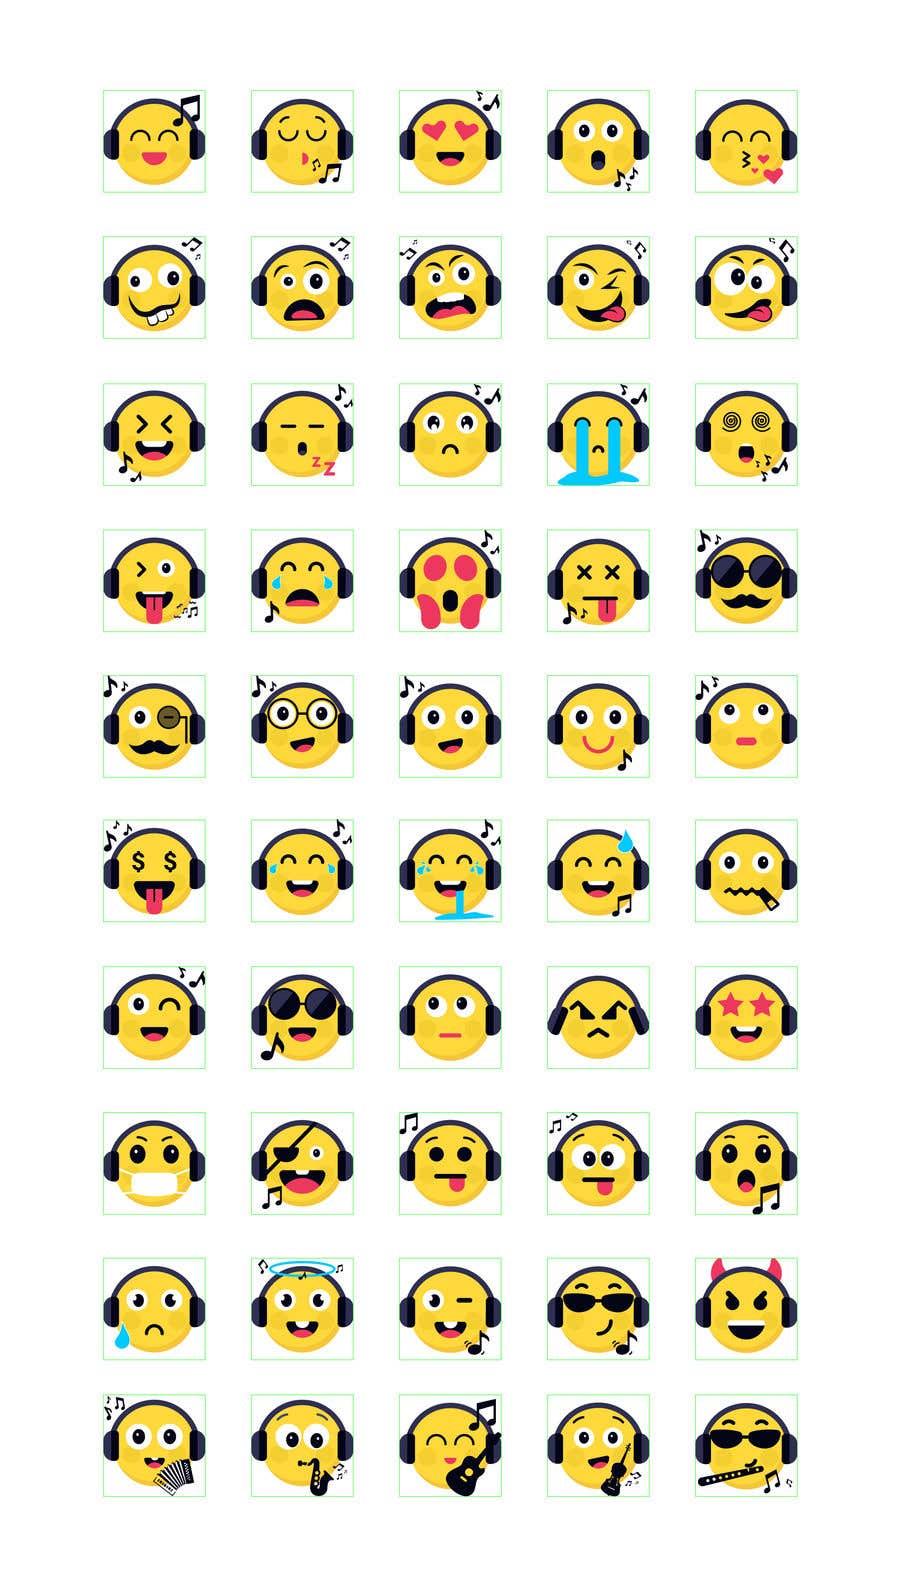 Bài tham dự cuộc thi #                                        175                                      cho                                         Design custom emojis for a YouTube-channel's membership program